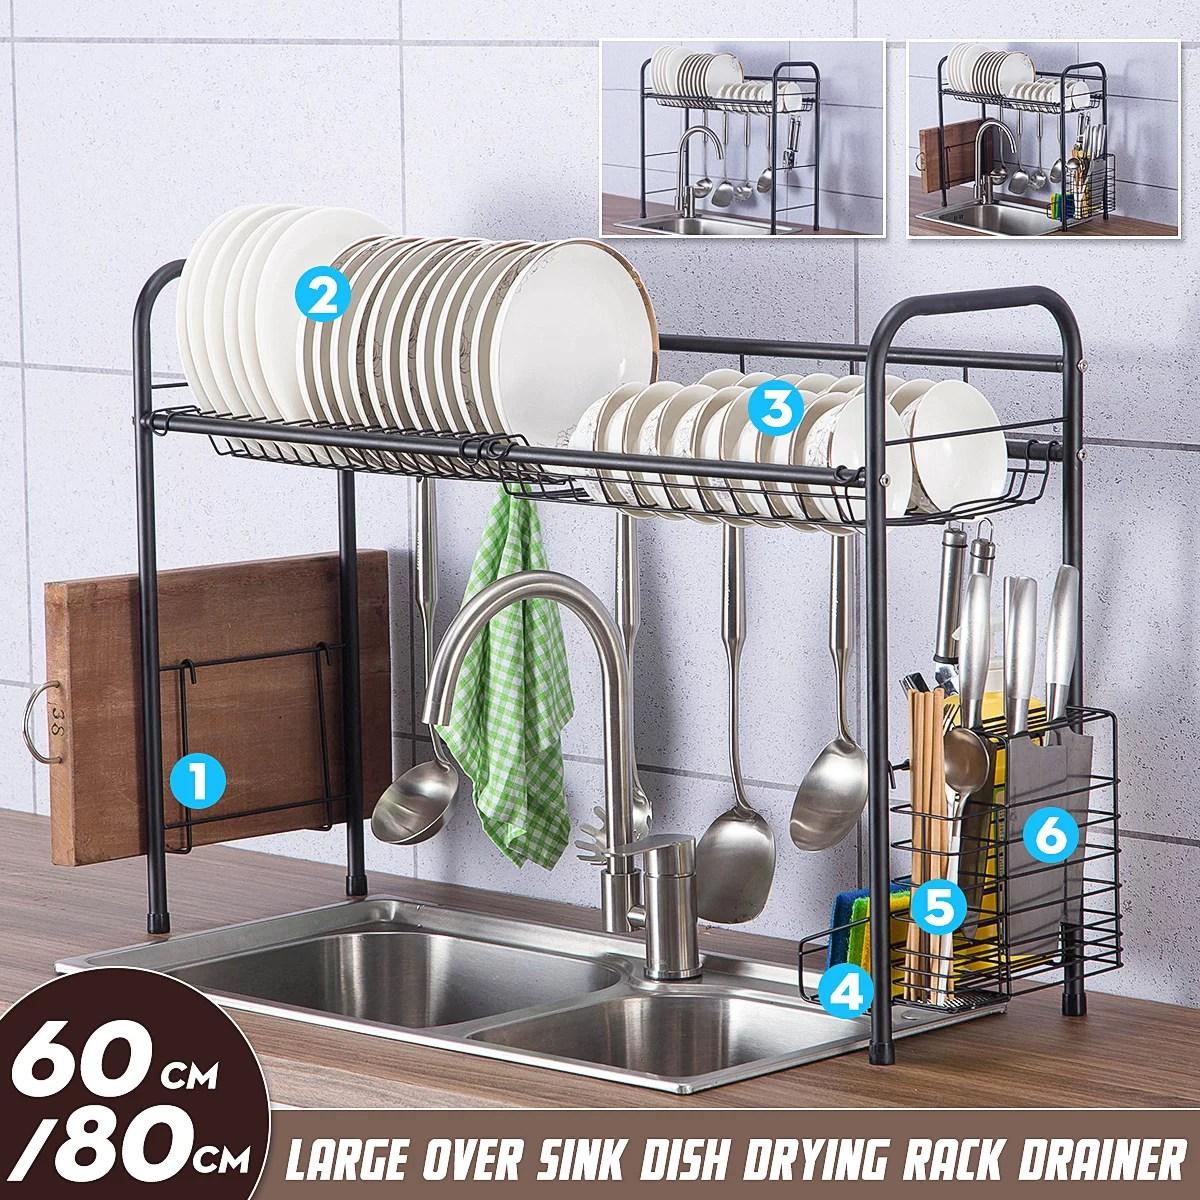 stainless steel dish drying rack utensil cutlery holder storage organizer rack 2 tier dish rack sink drainer home kitchen dish drainer